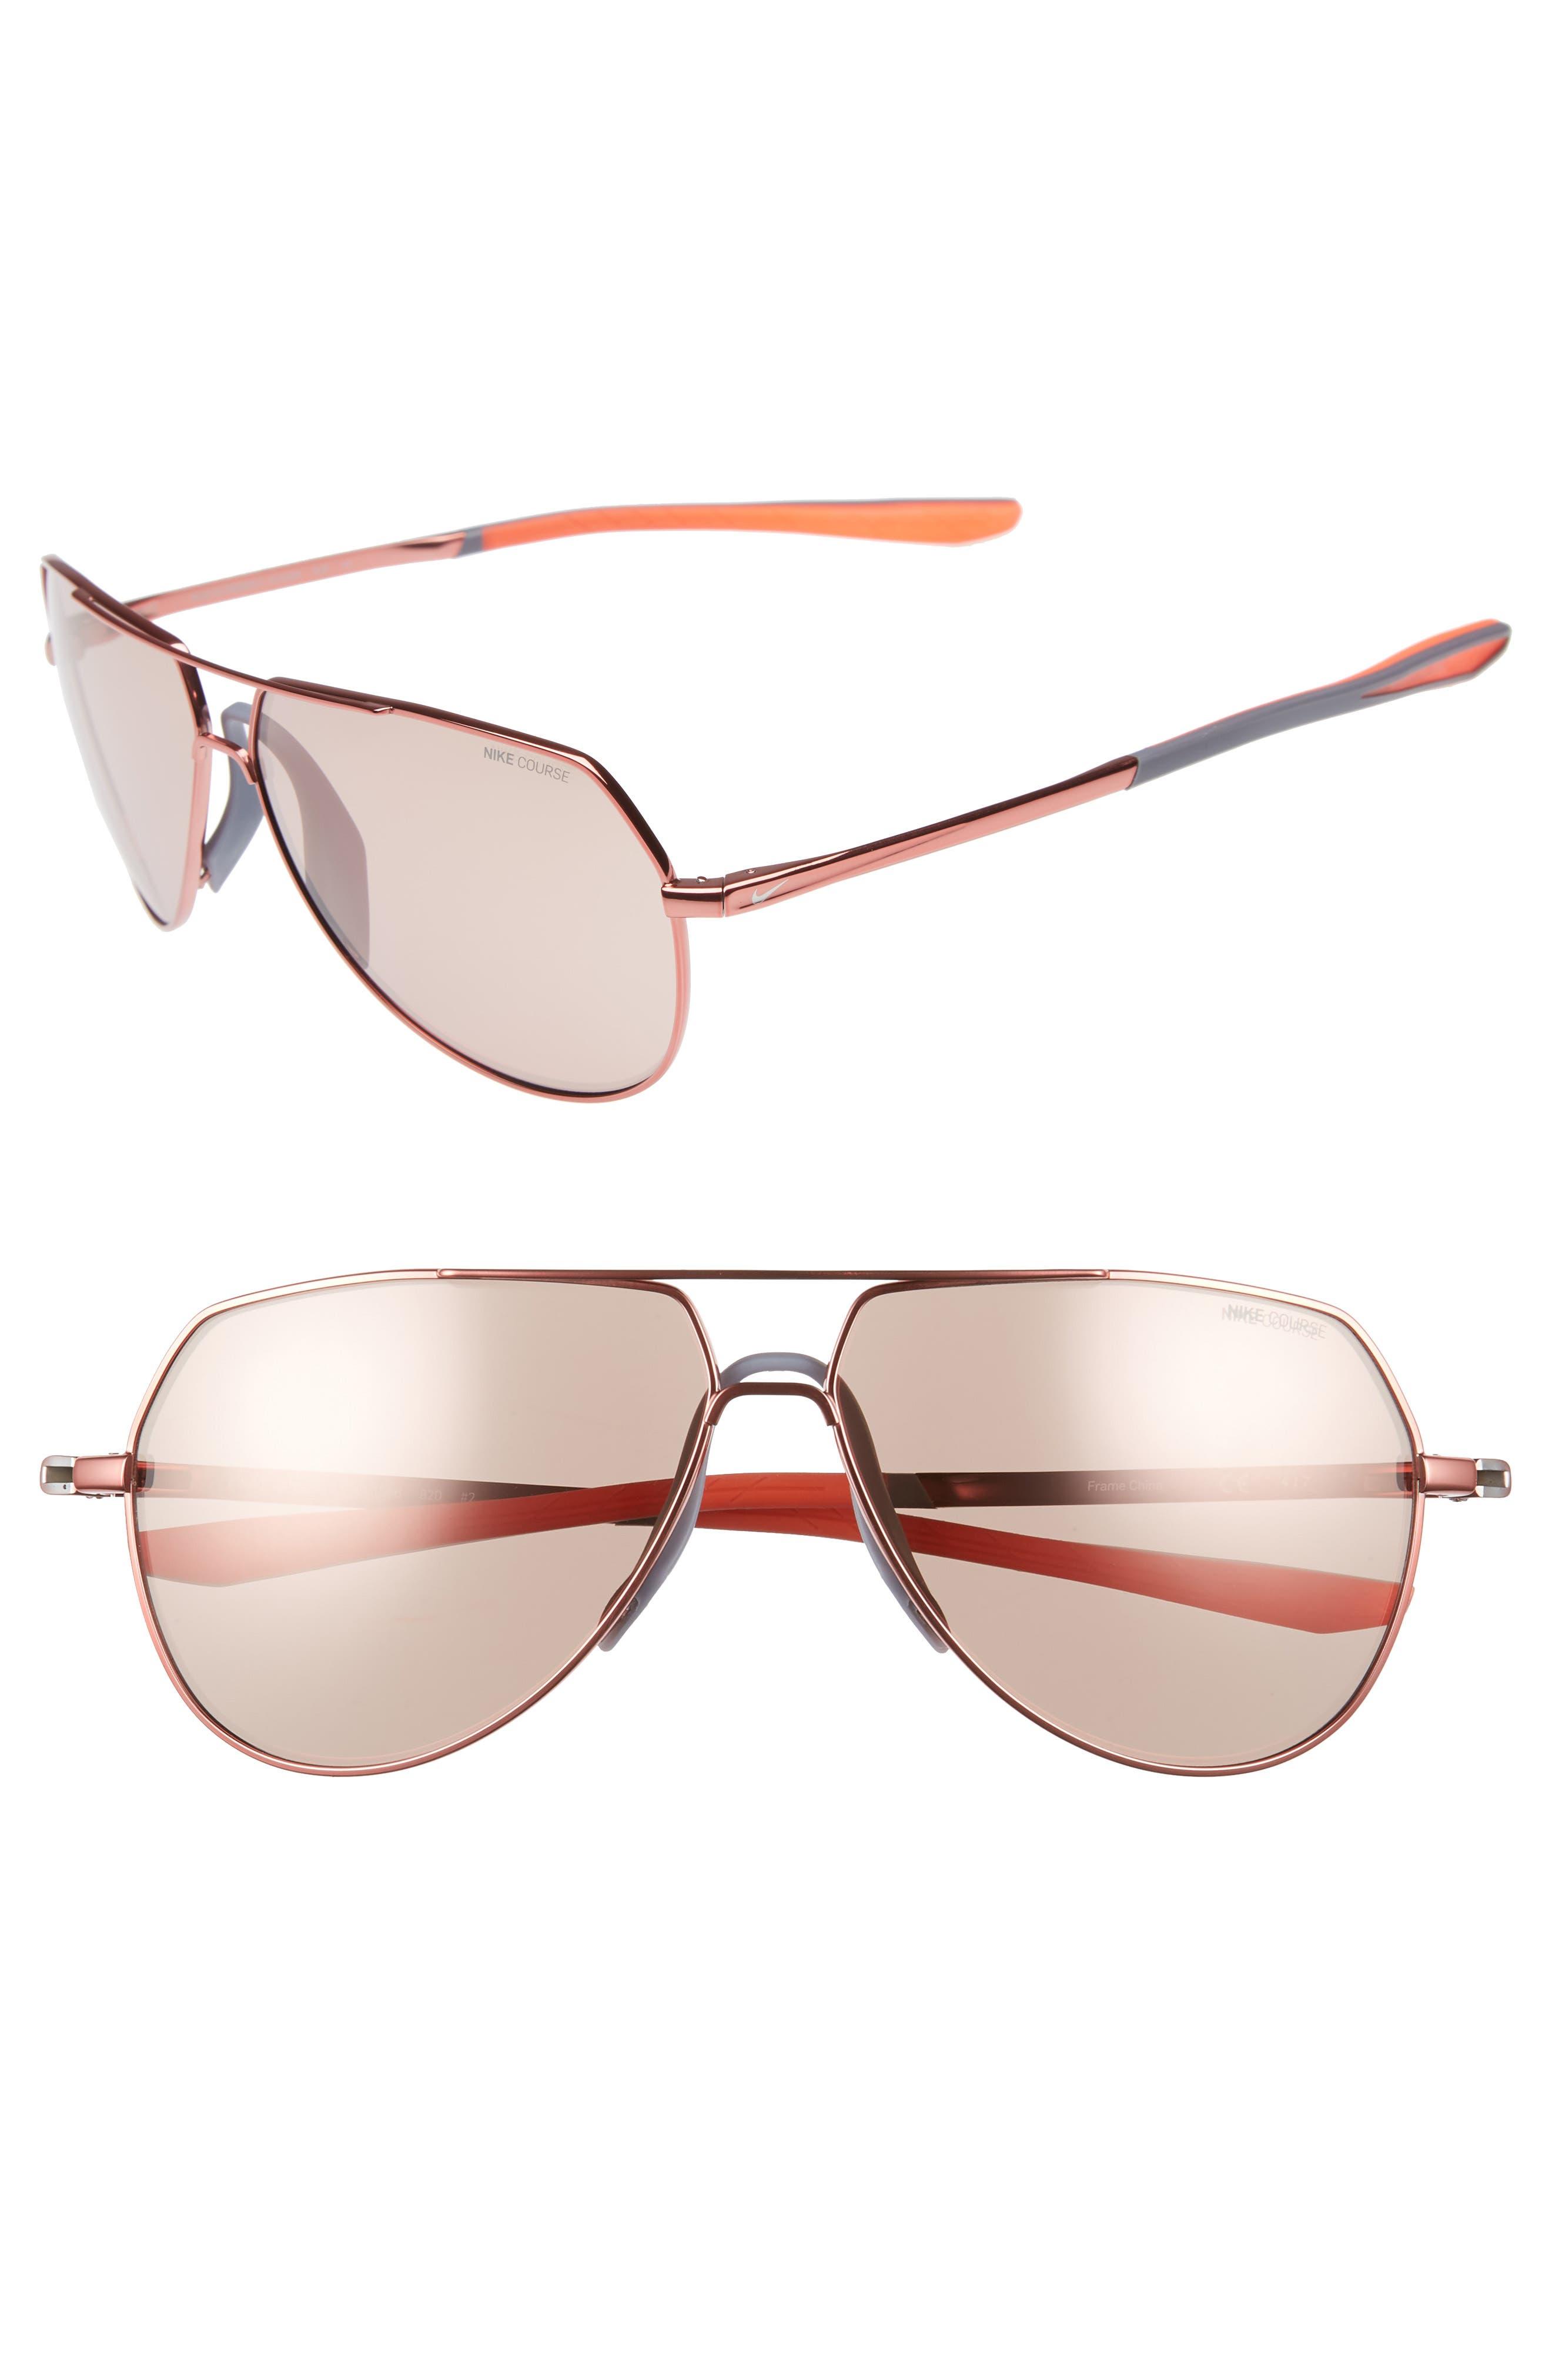 Outrider E 62mm Oversize Aviator Sunglasses,                             Main thumbnail 1, color,                             Total Crimson/ Golf